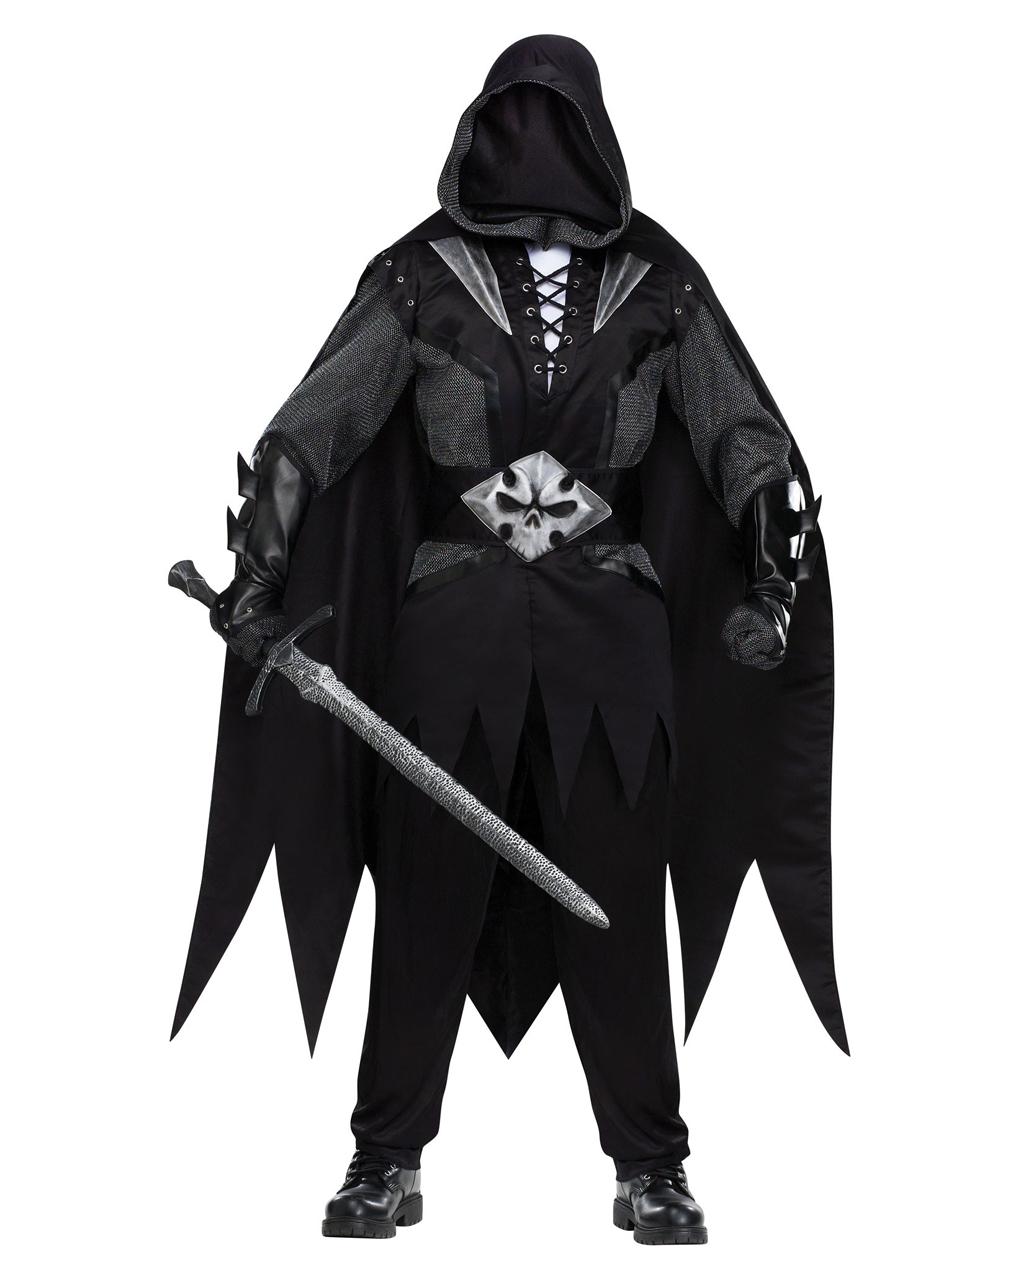 Dark Knight Costume ...  sc 1 st  Horror-Shop.com & Dark Knight Costume for Halloween | horror-shop.com